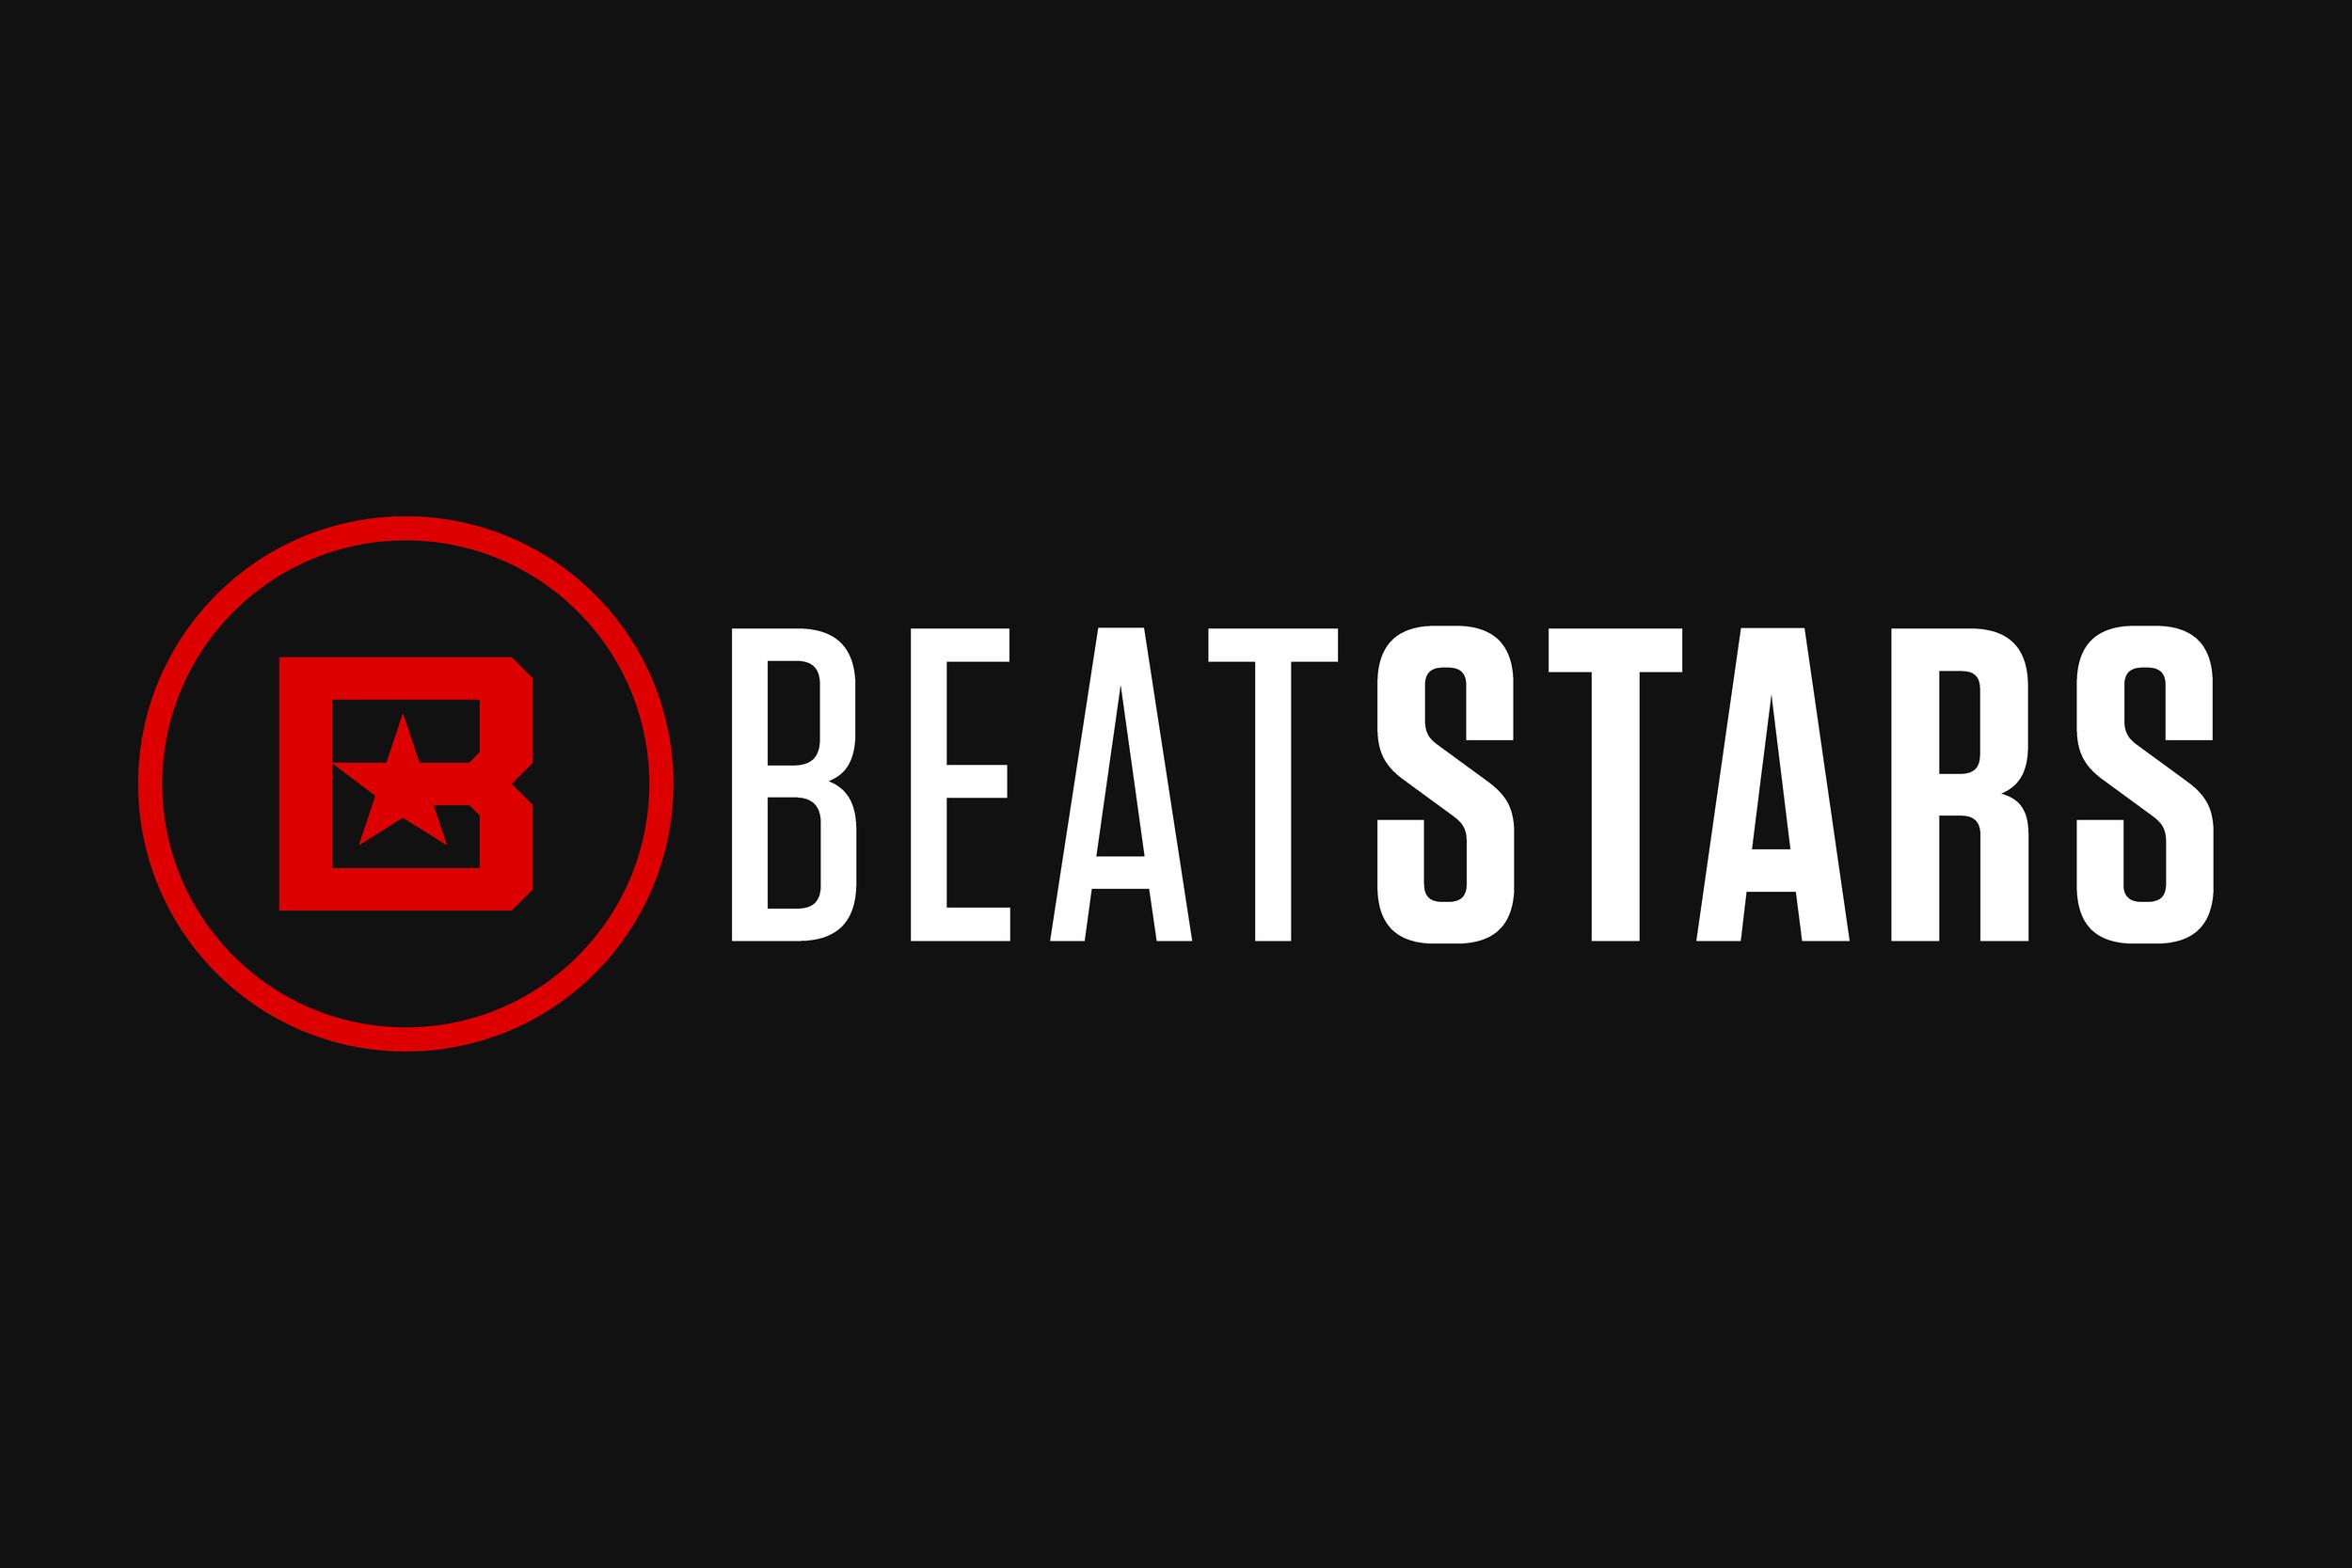 beatstars-full-logo copy.png